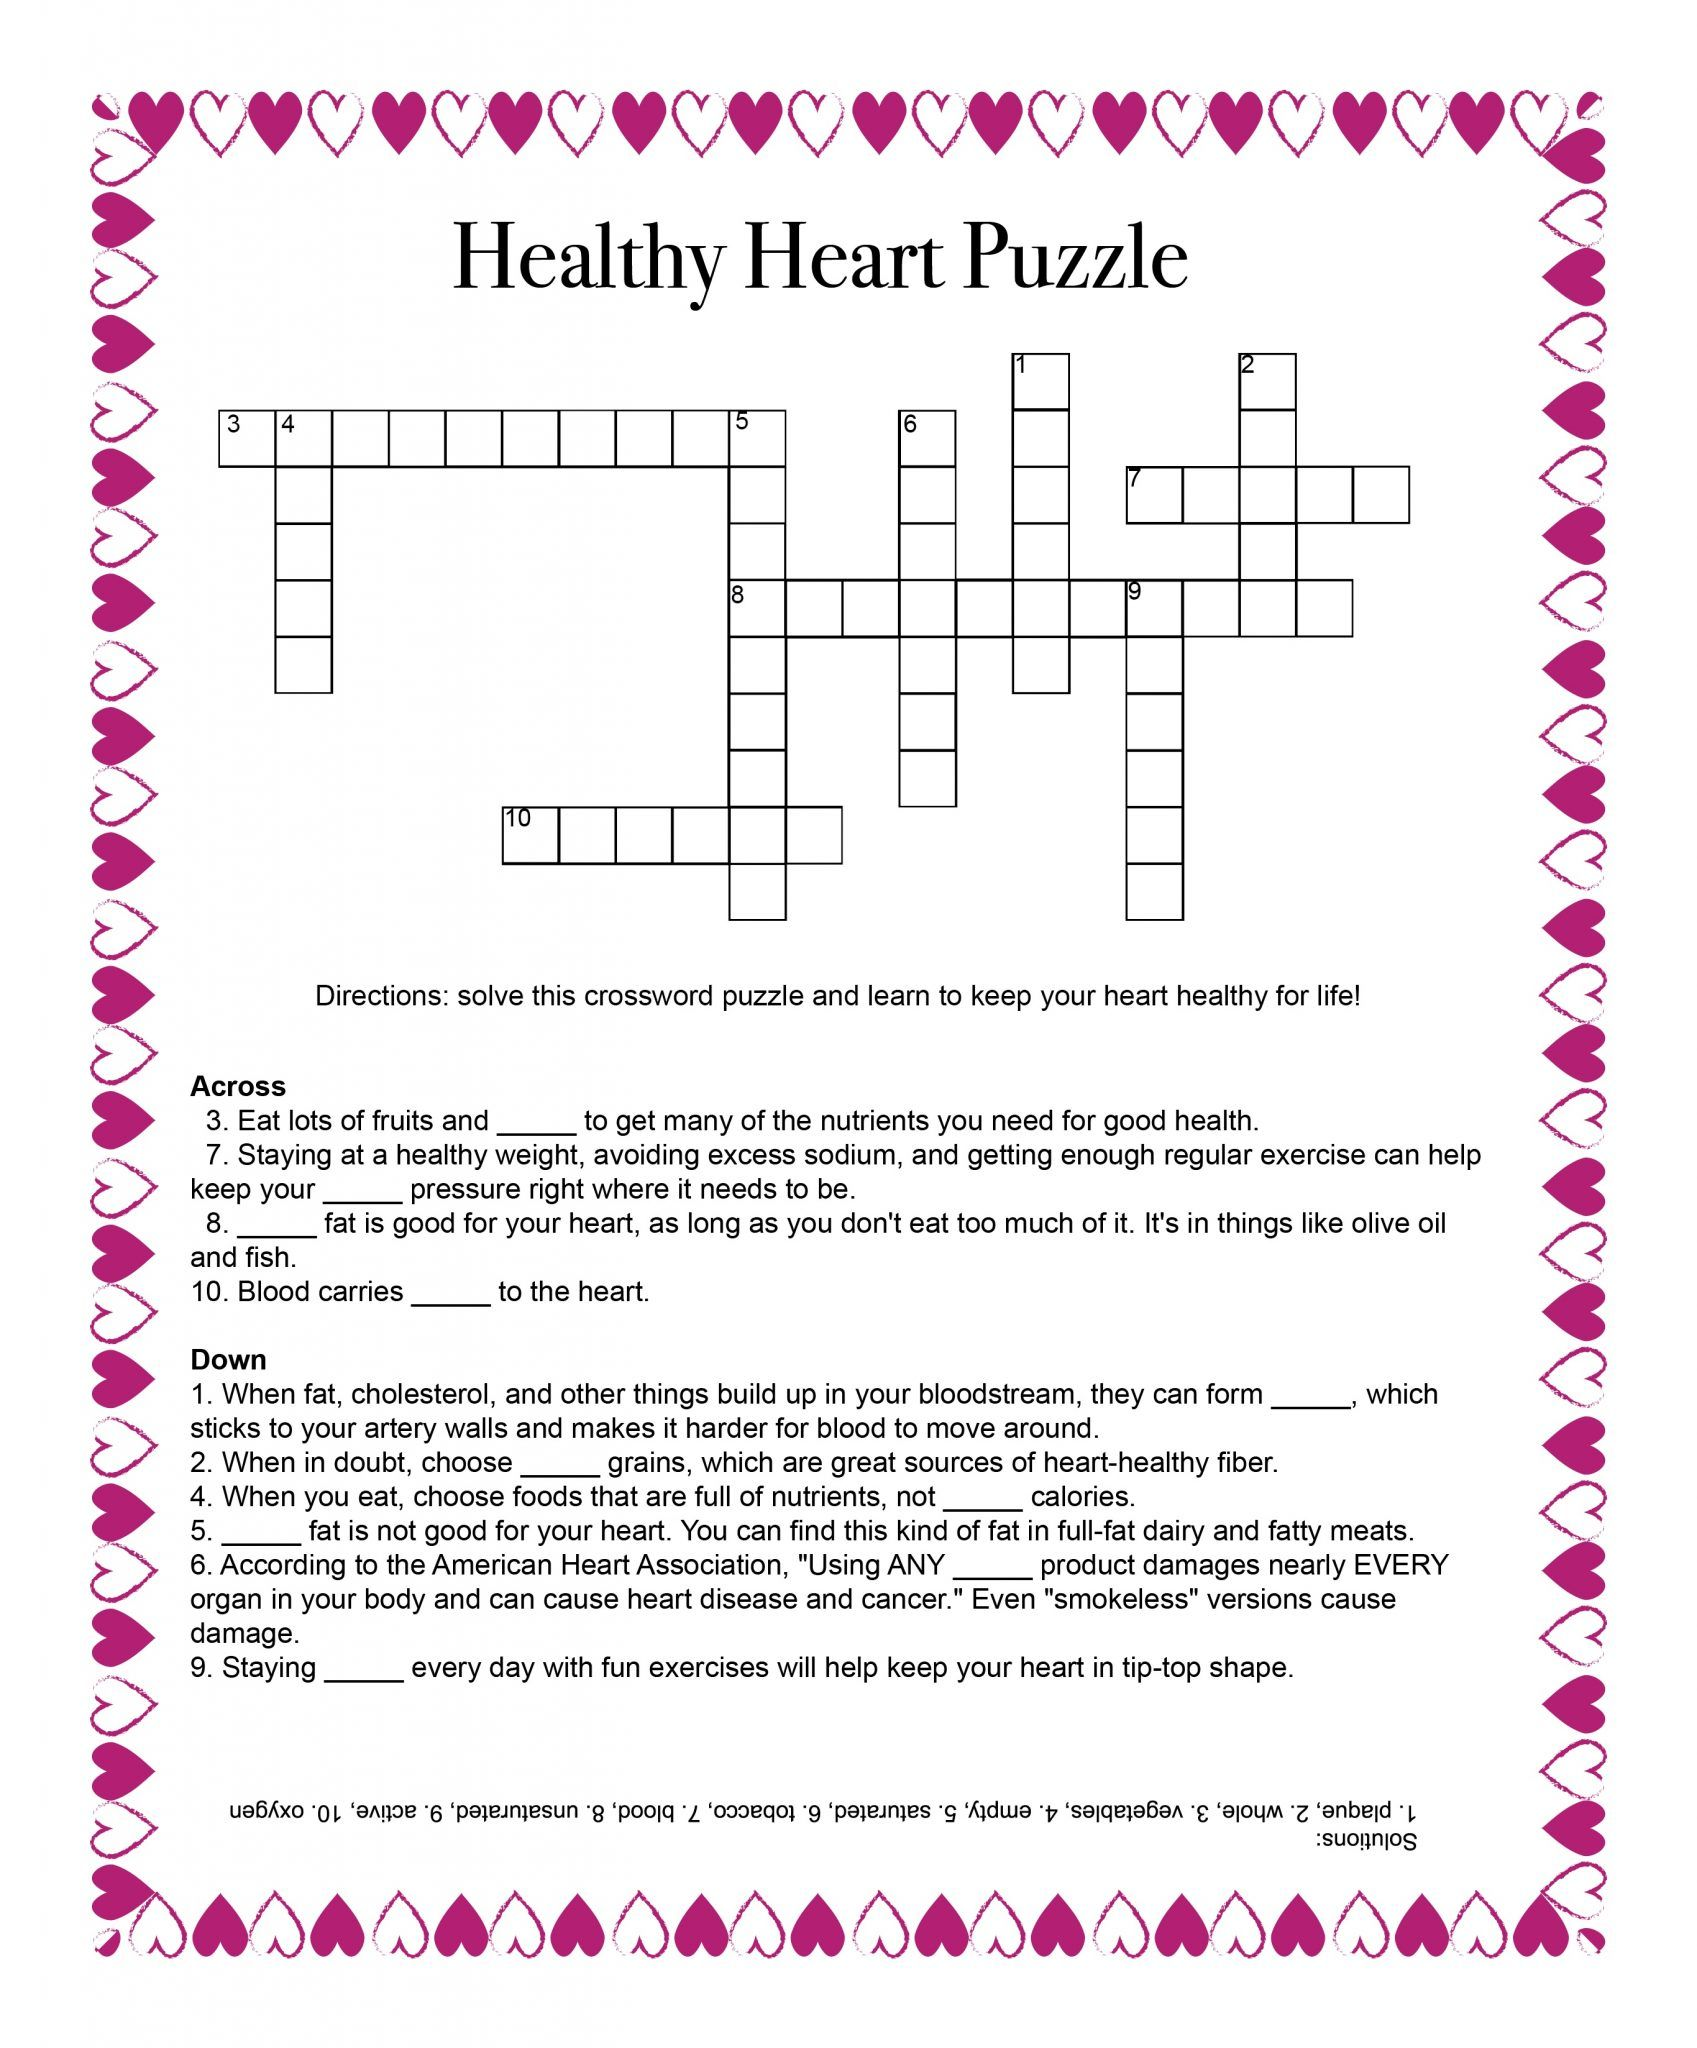 Healthy Heart Puzzle